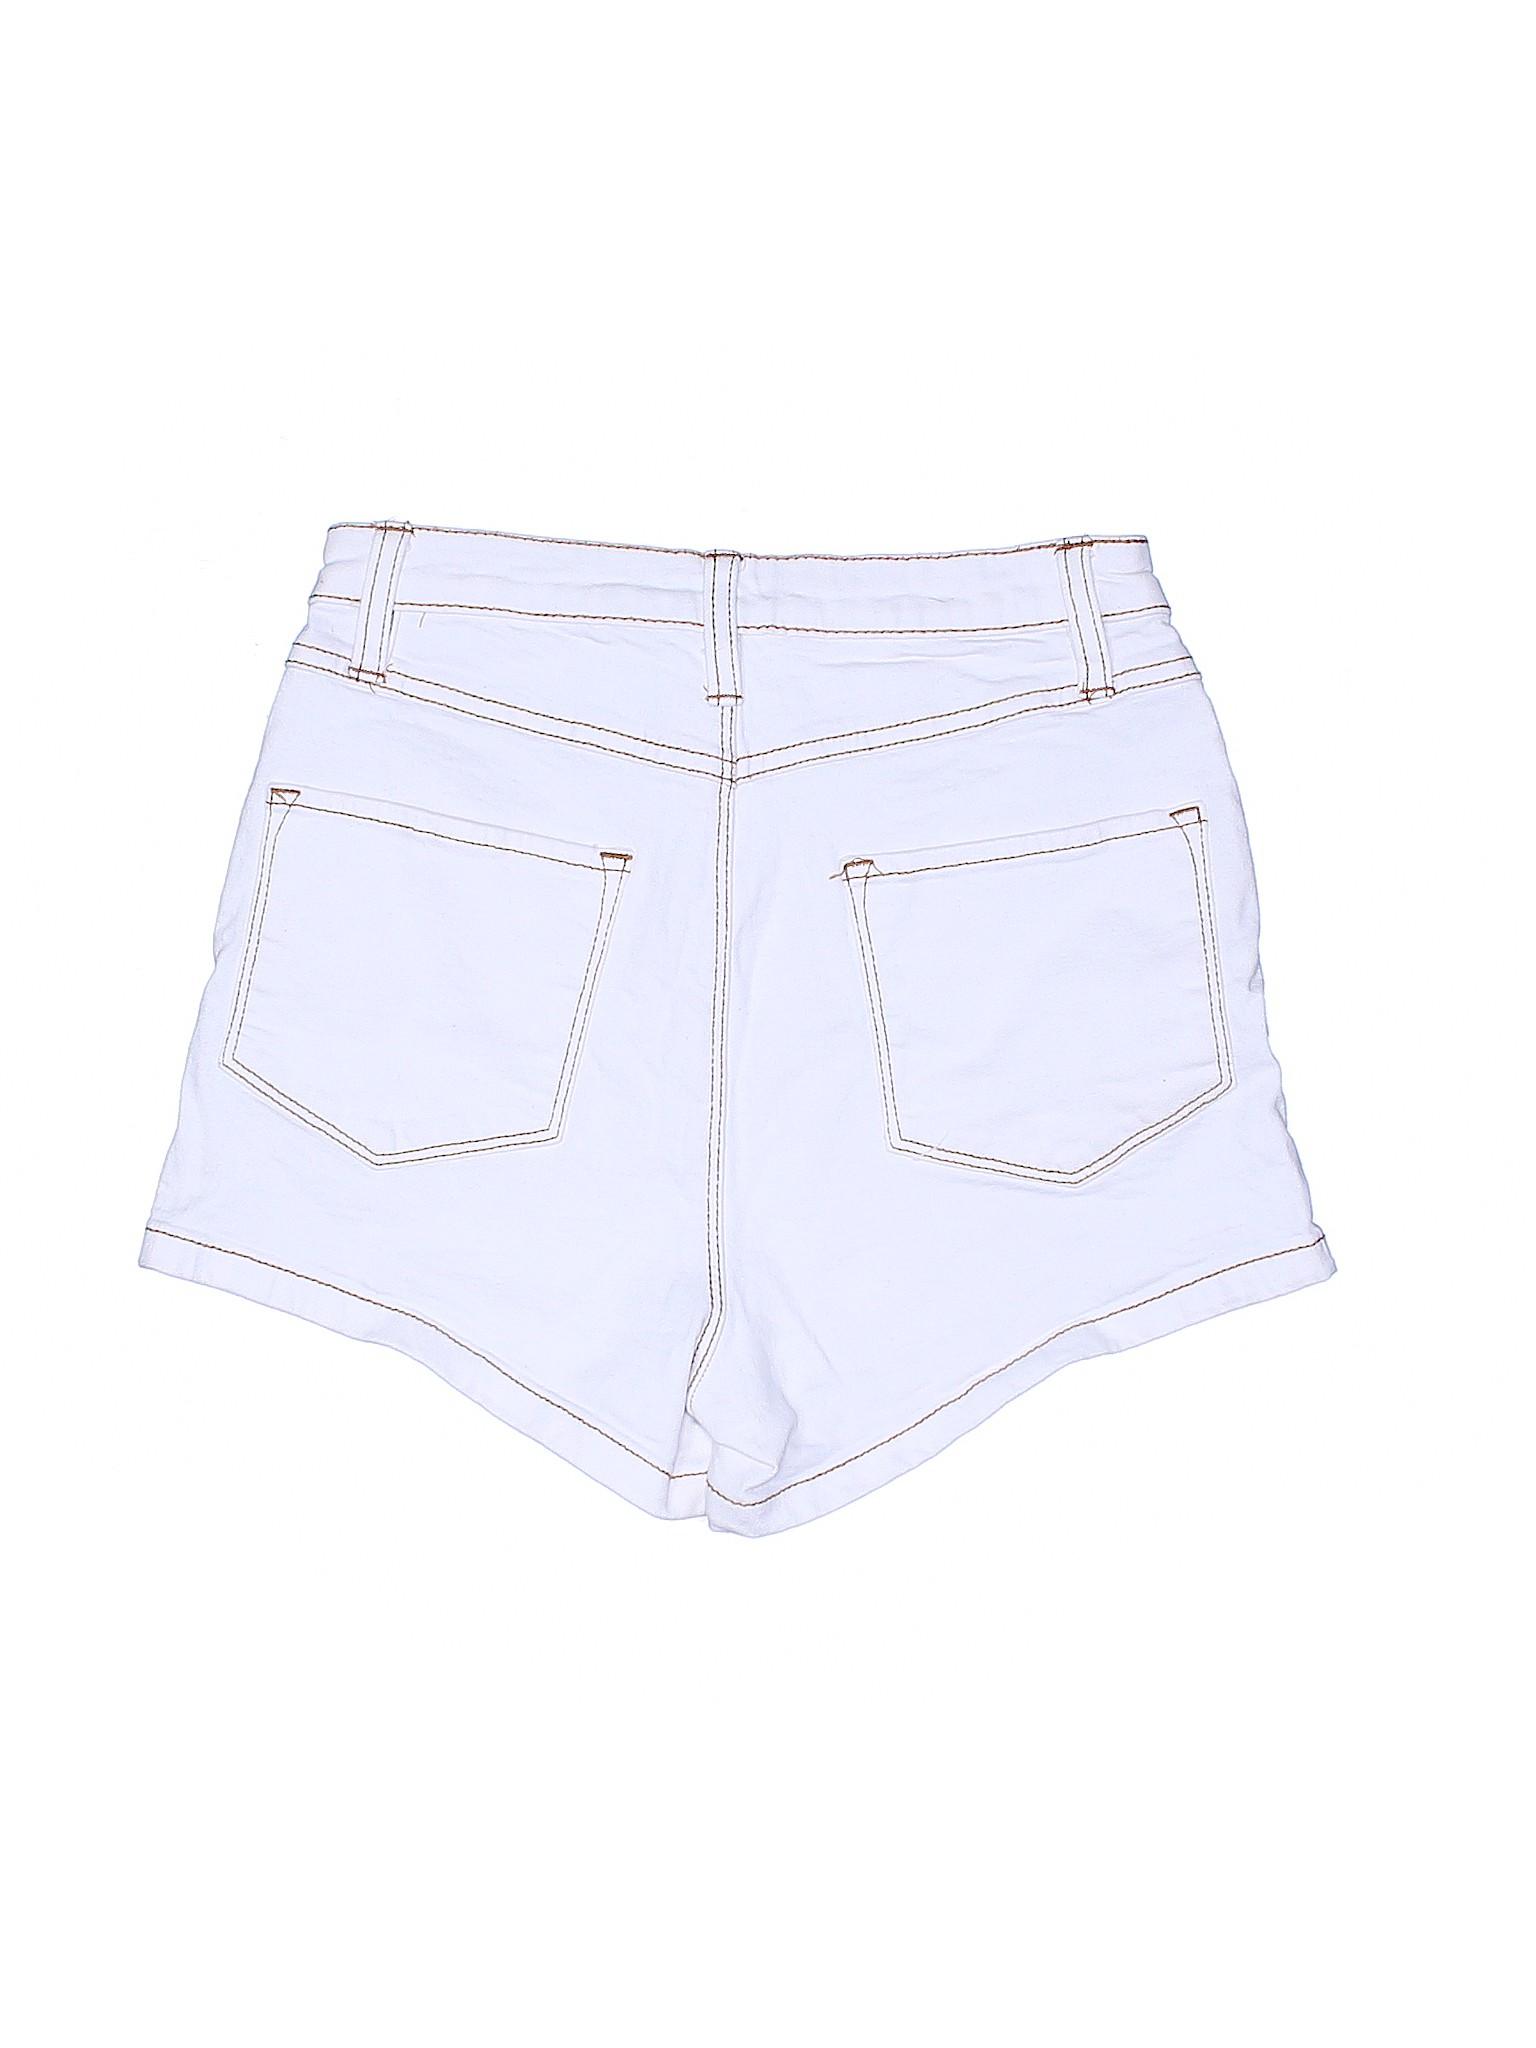 winter Shorts On Denim Leisure Cotton XgwdqnUU4z